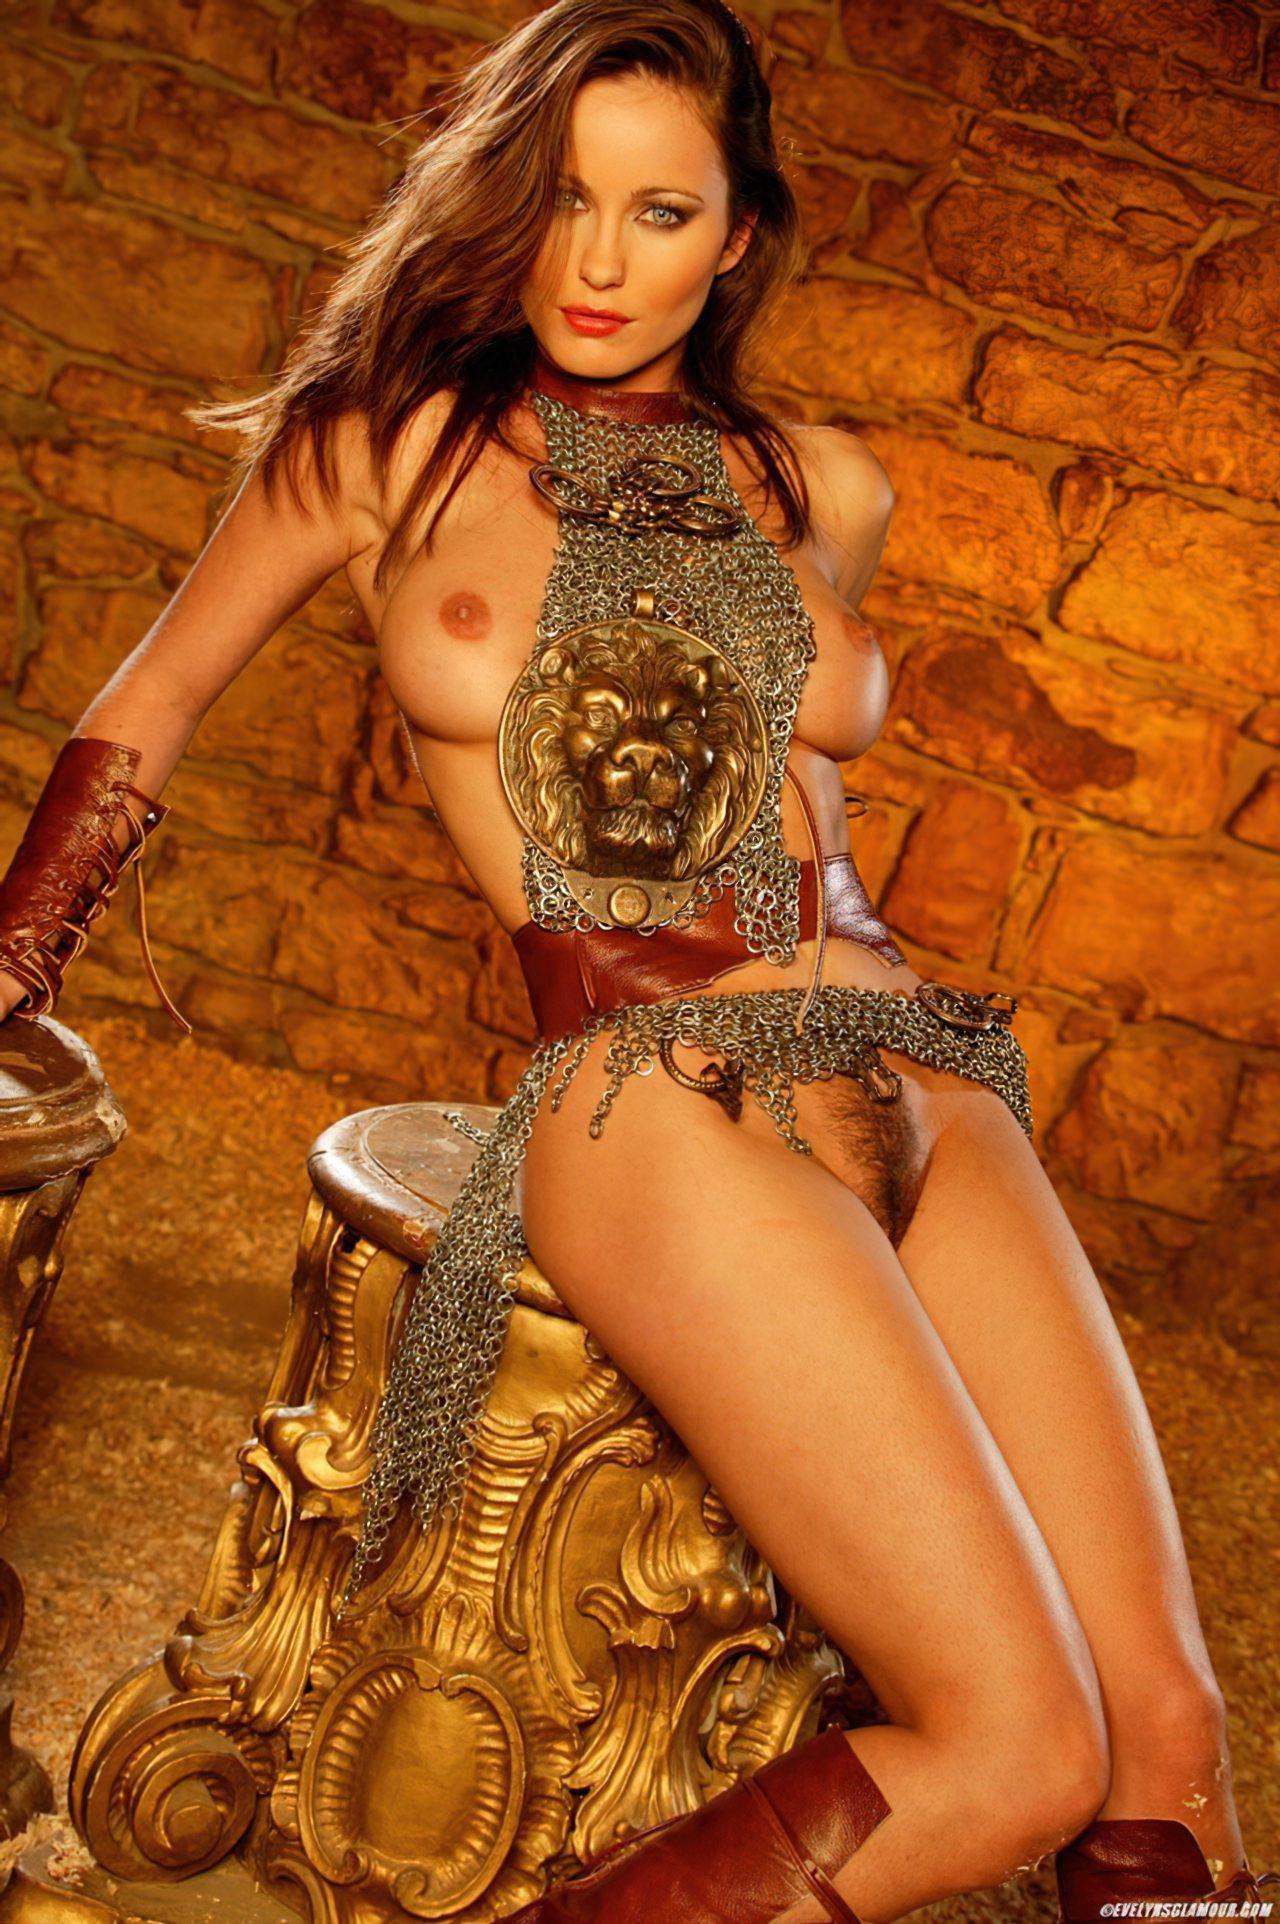 Mulher Gostosa (5)